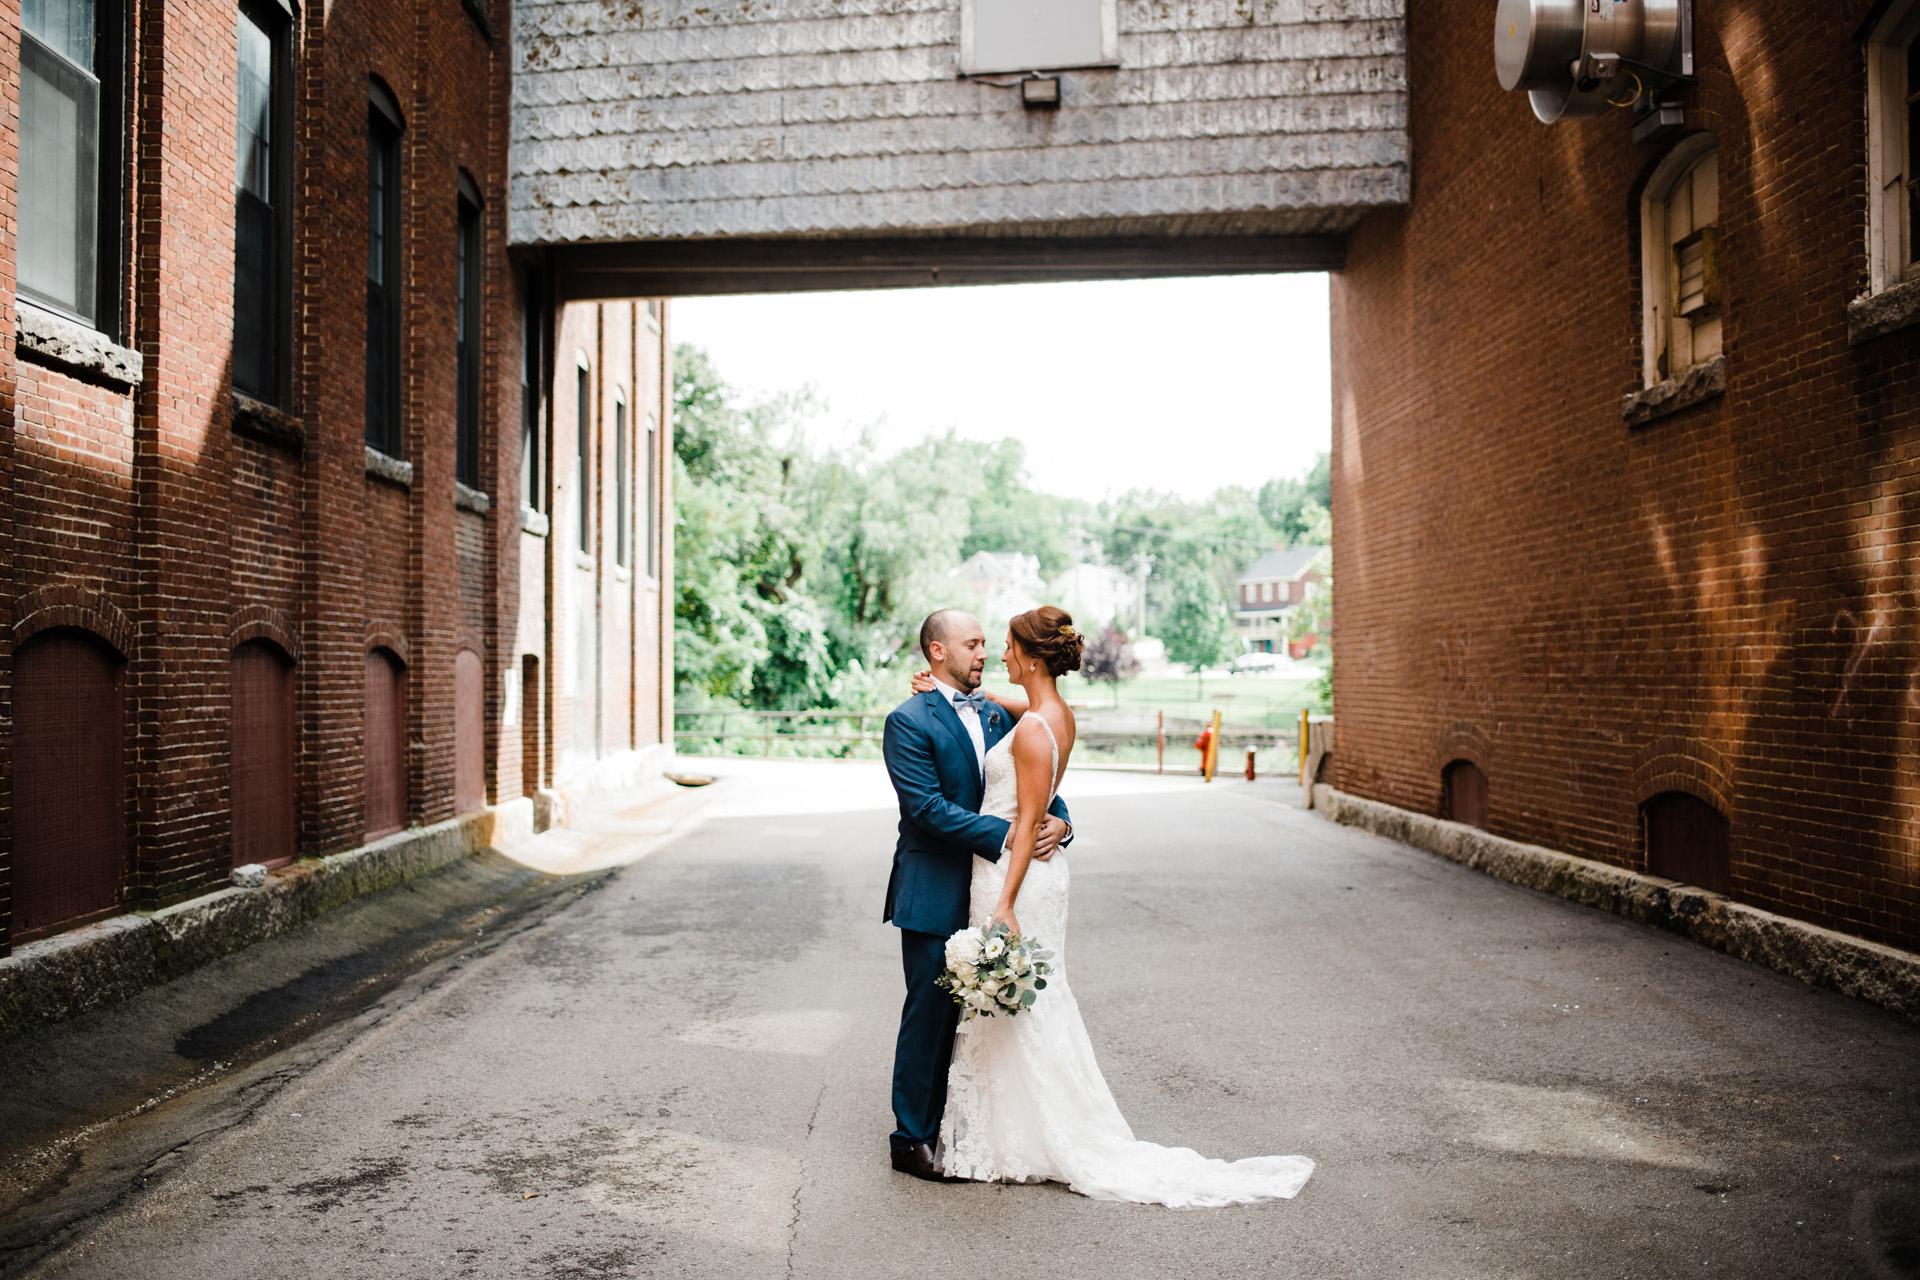 rivermill-new-hampshire-wedding-20